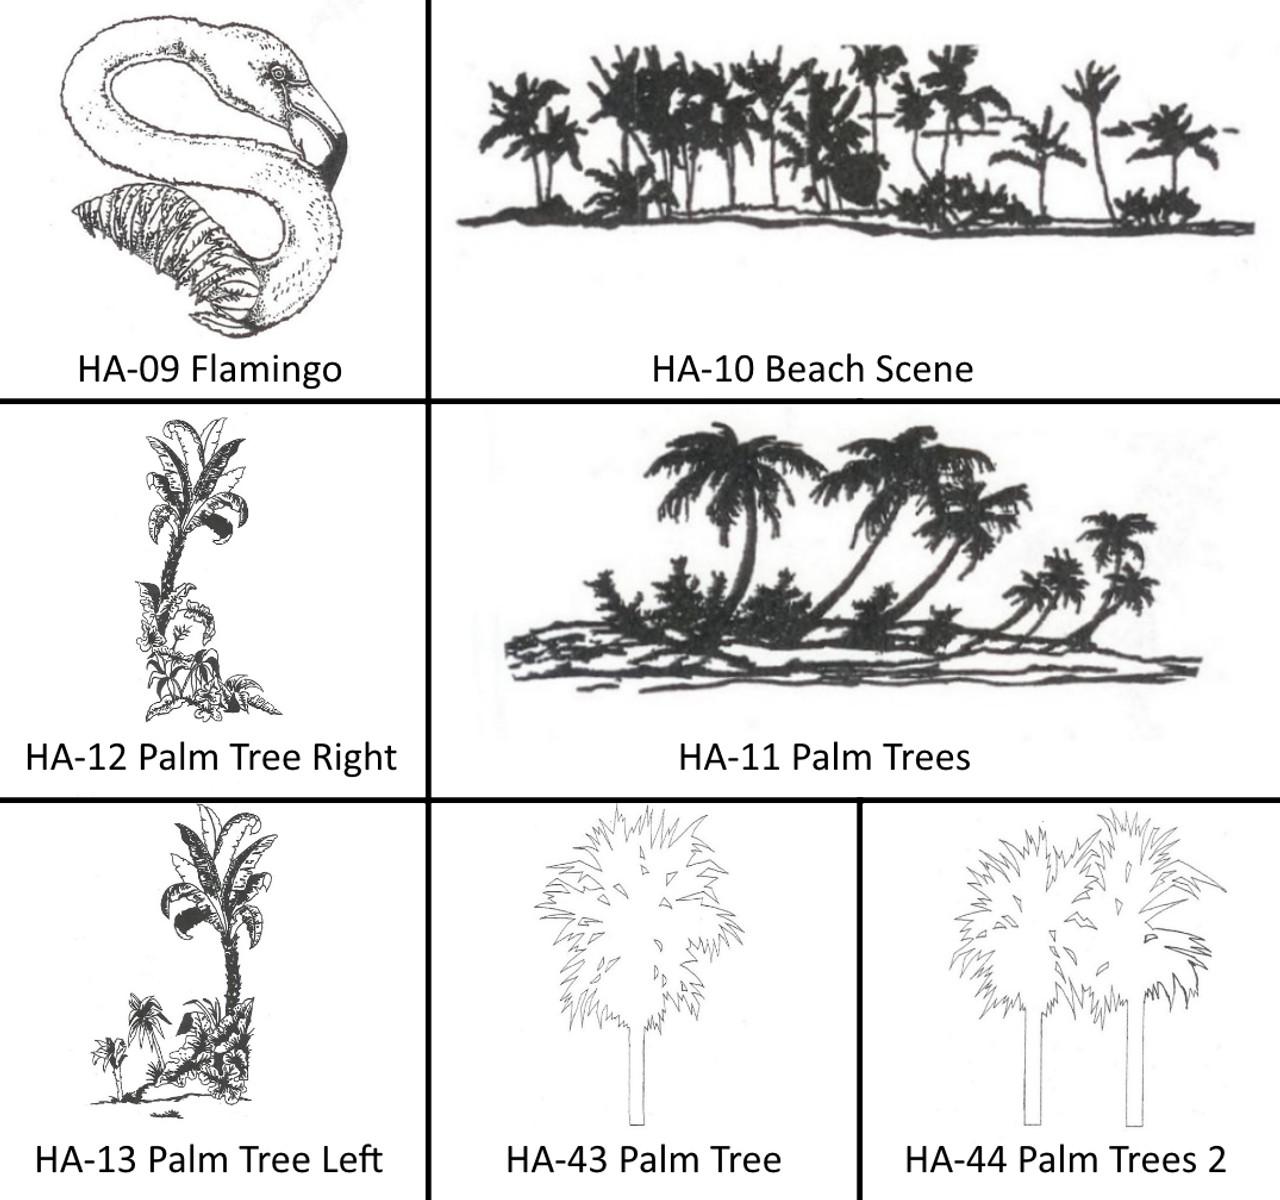 Engravable Images HA-09 to HA-44